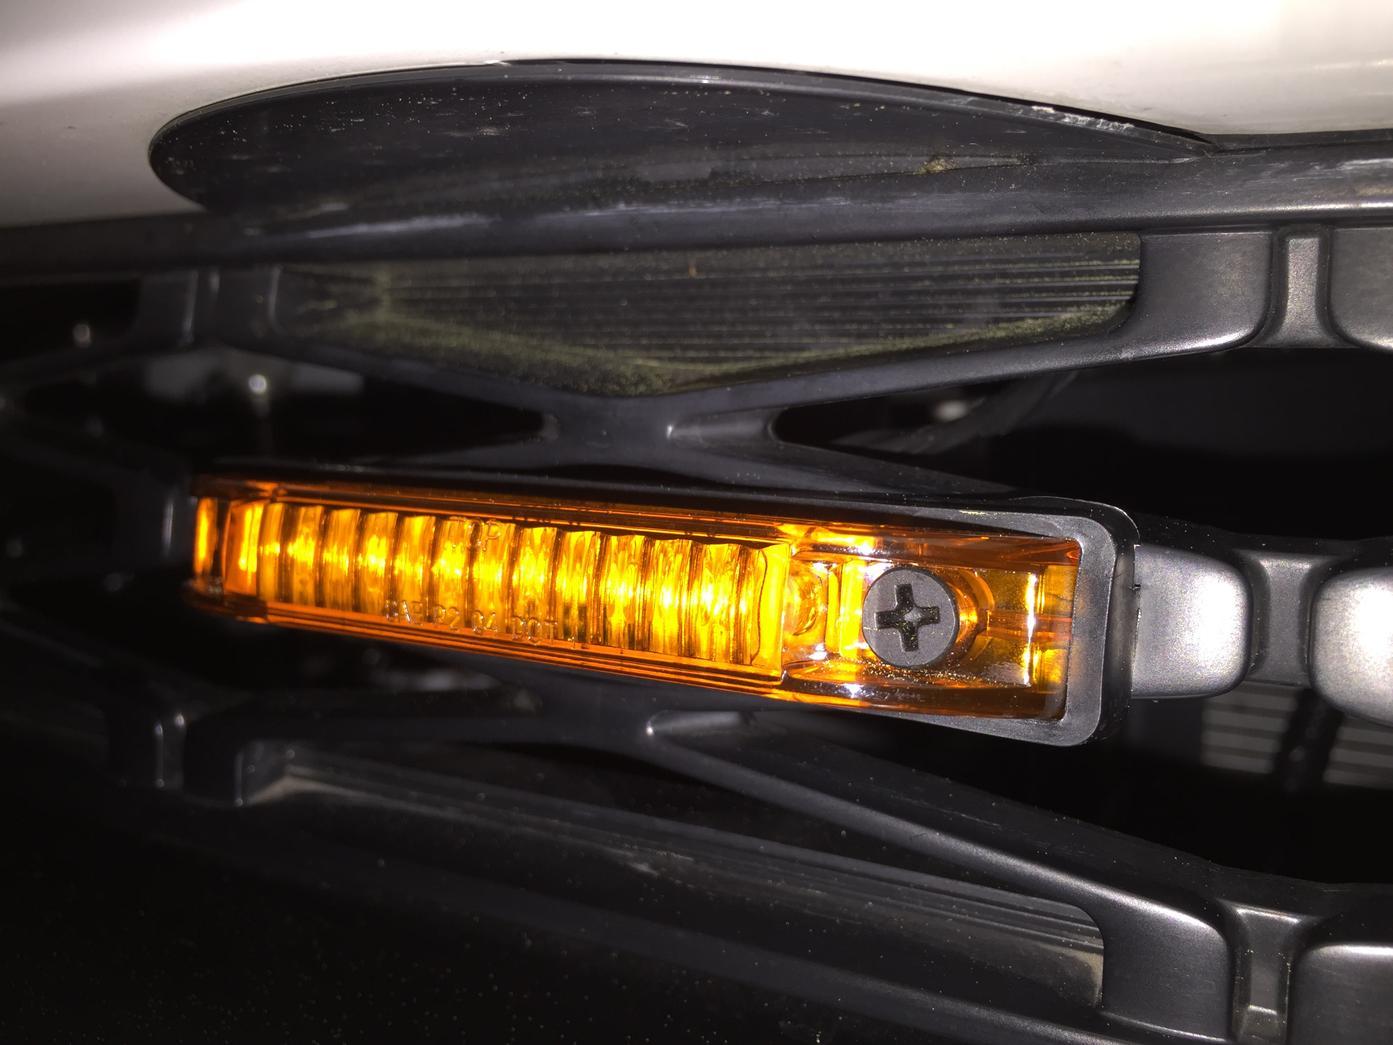 Range Rover Gwinnett >> 5th Gen Marker Lights in Grill - Page 3 - Toyota 4Runner ...